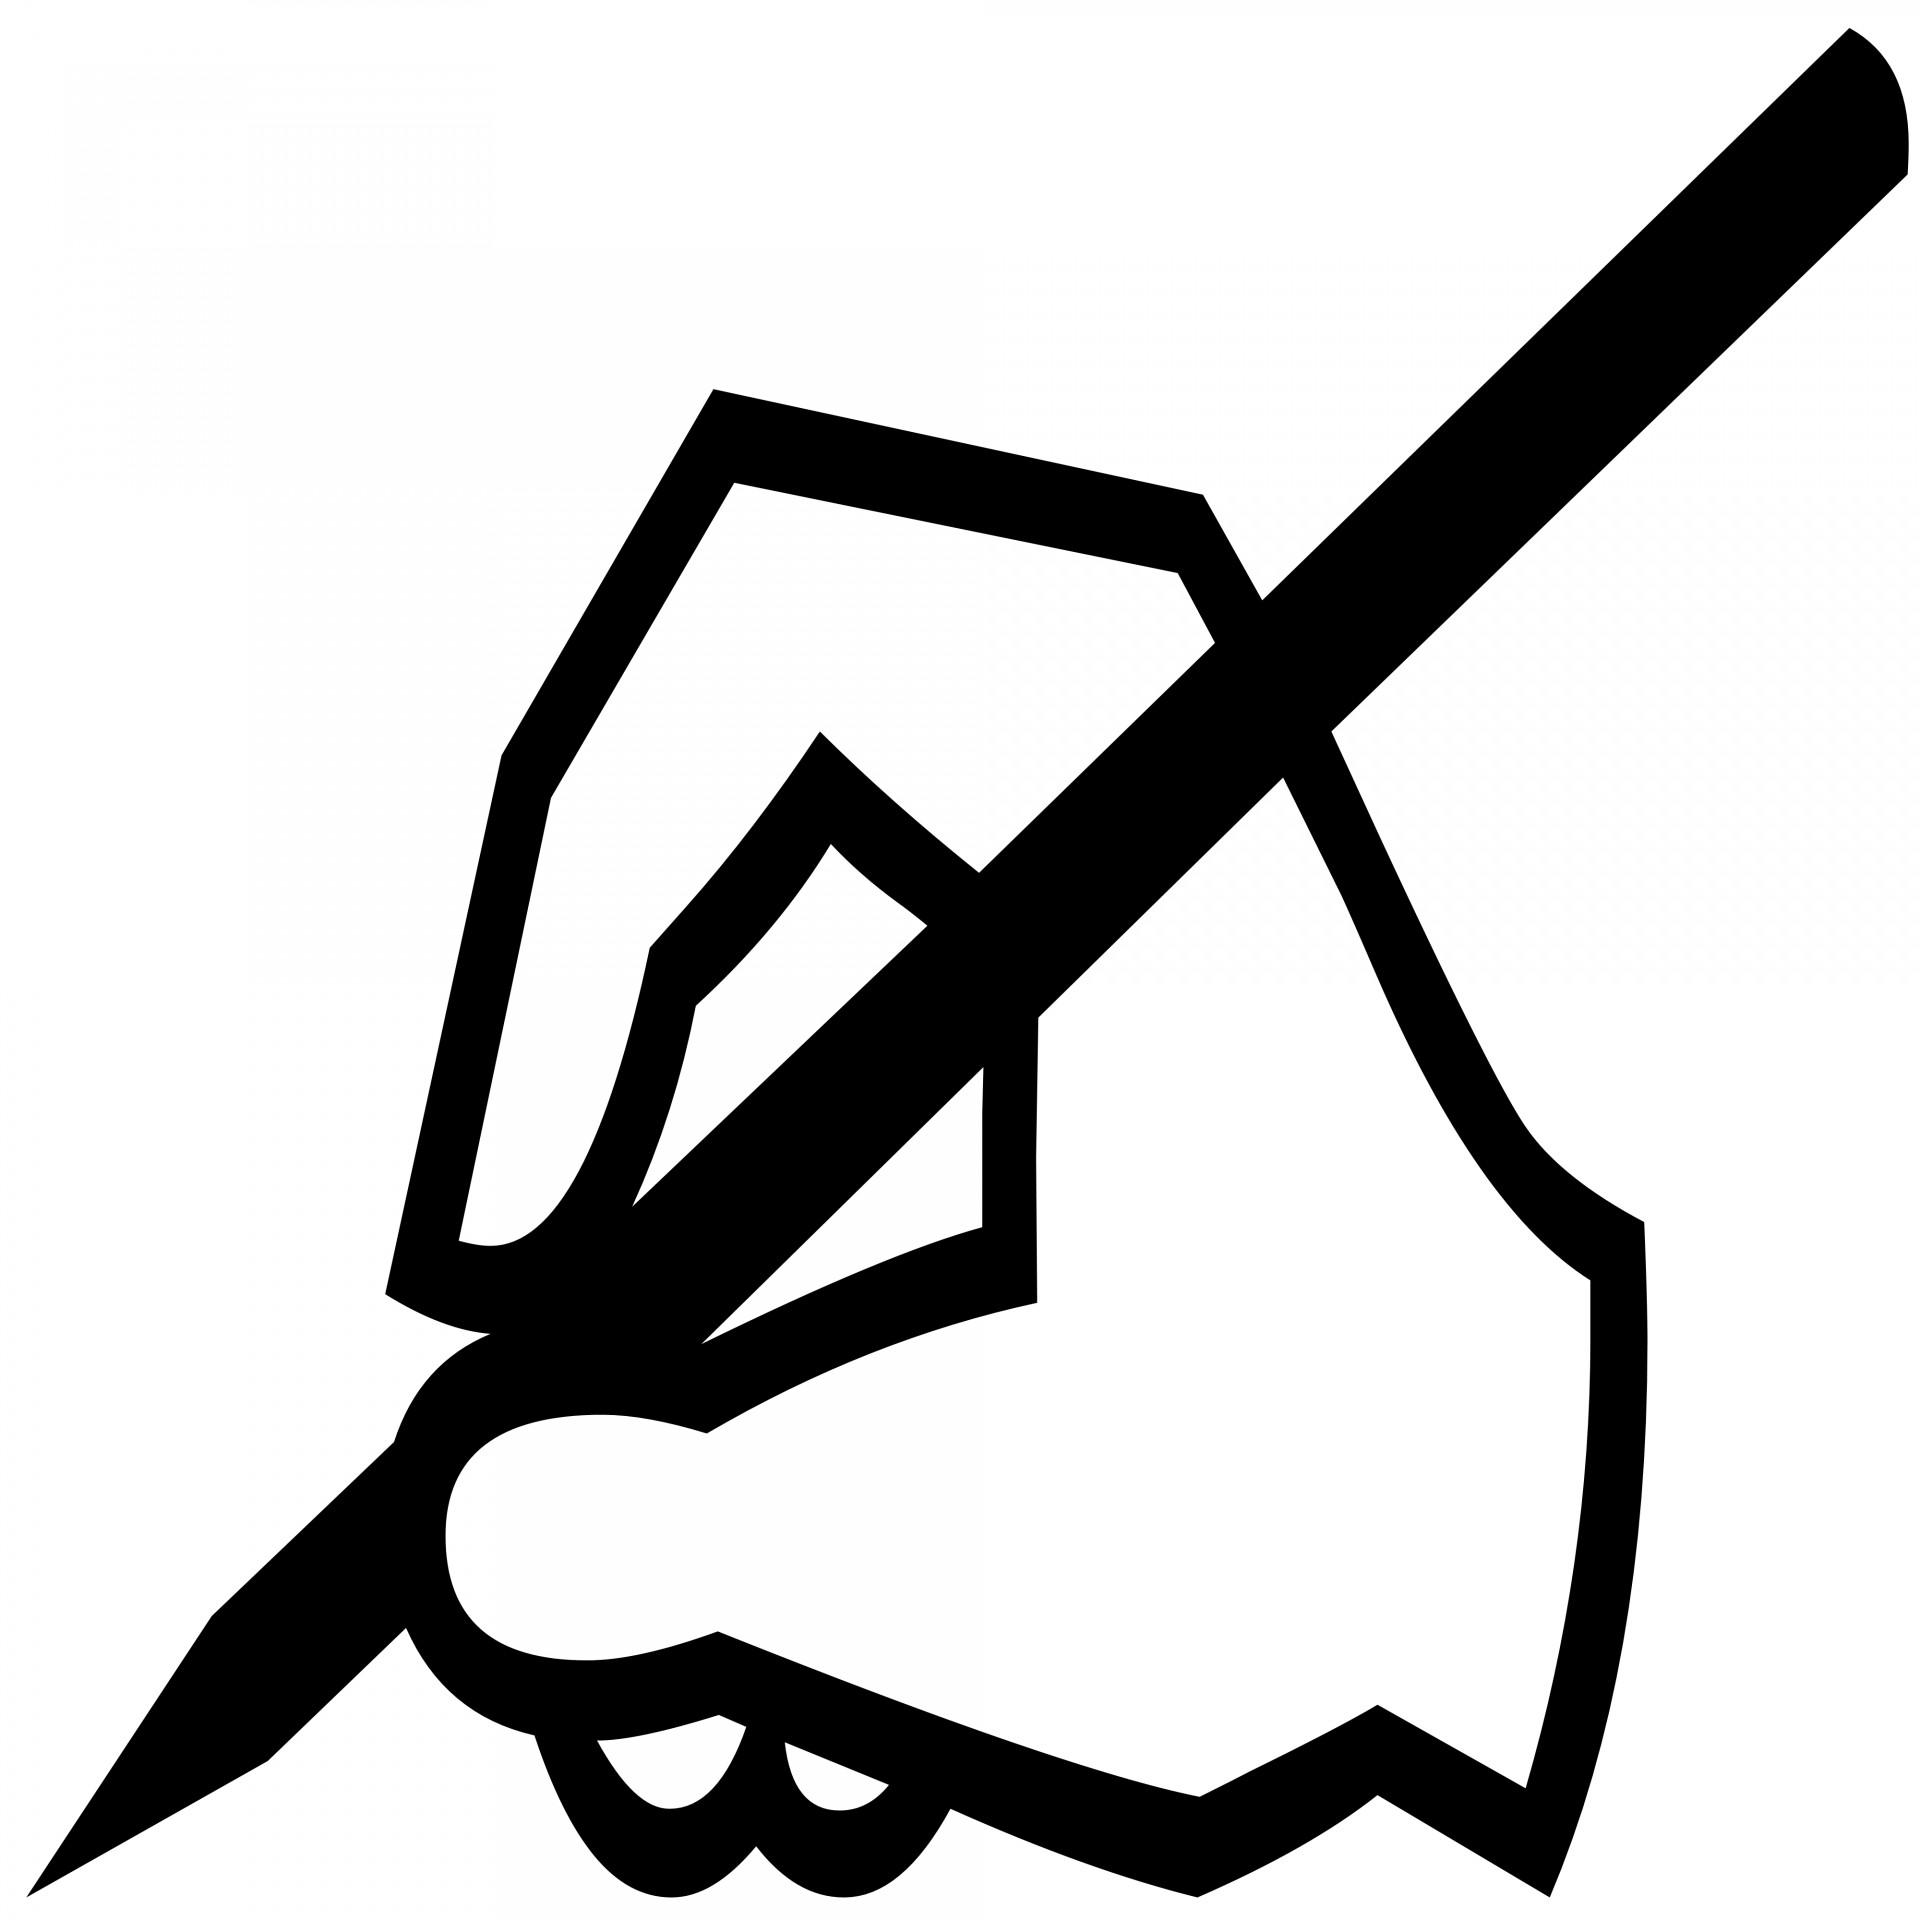 1920x1920 Writing Hand Silhouette Free Stock Photo